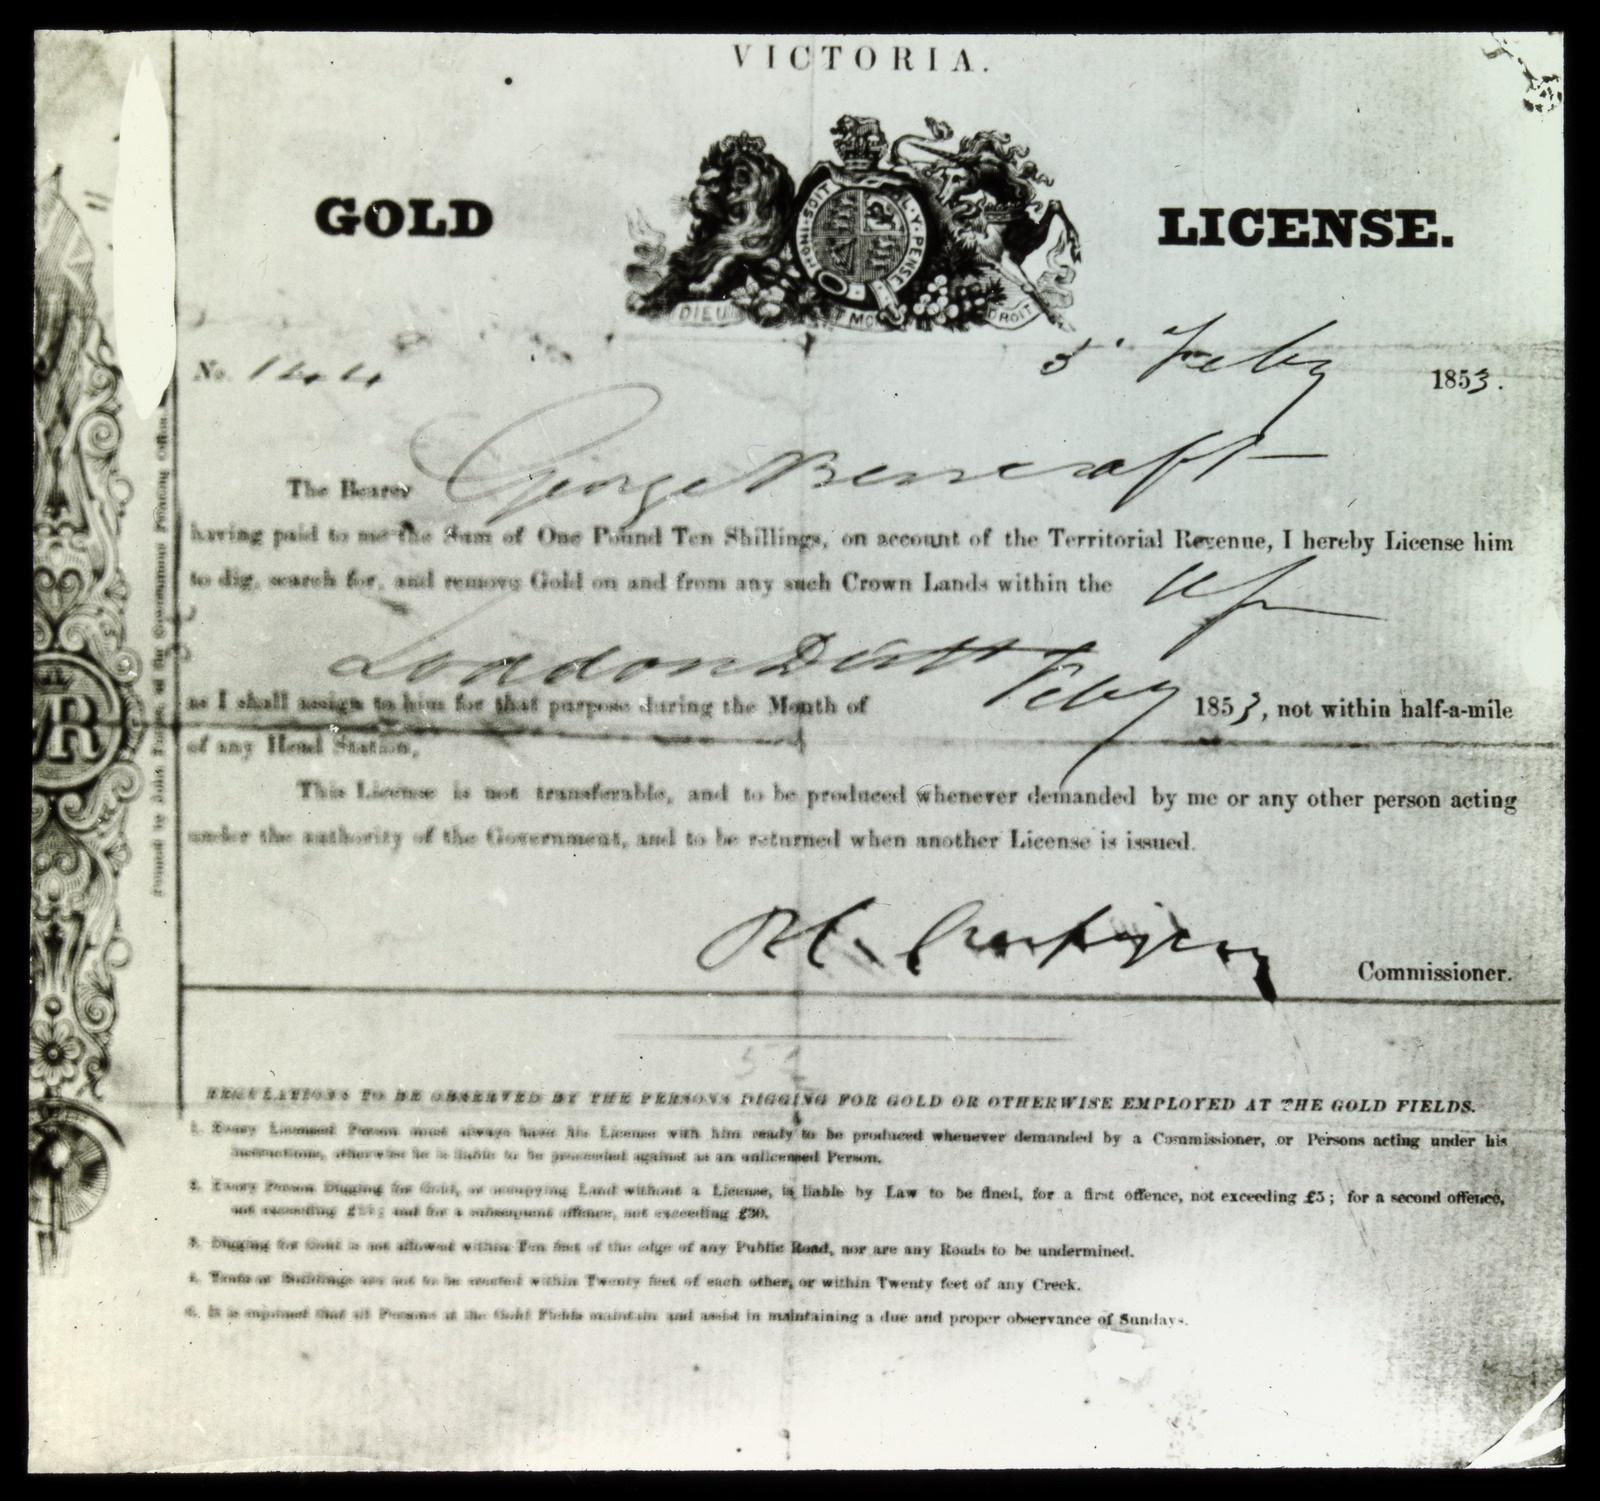 Crespigny license February 1853 Loddon